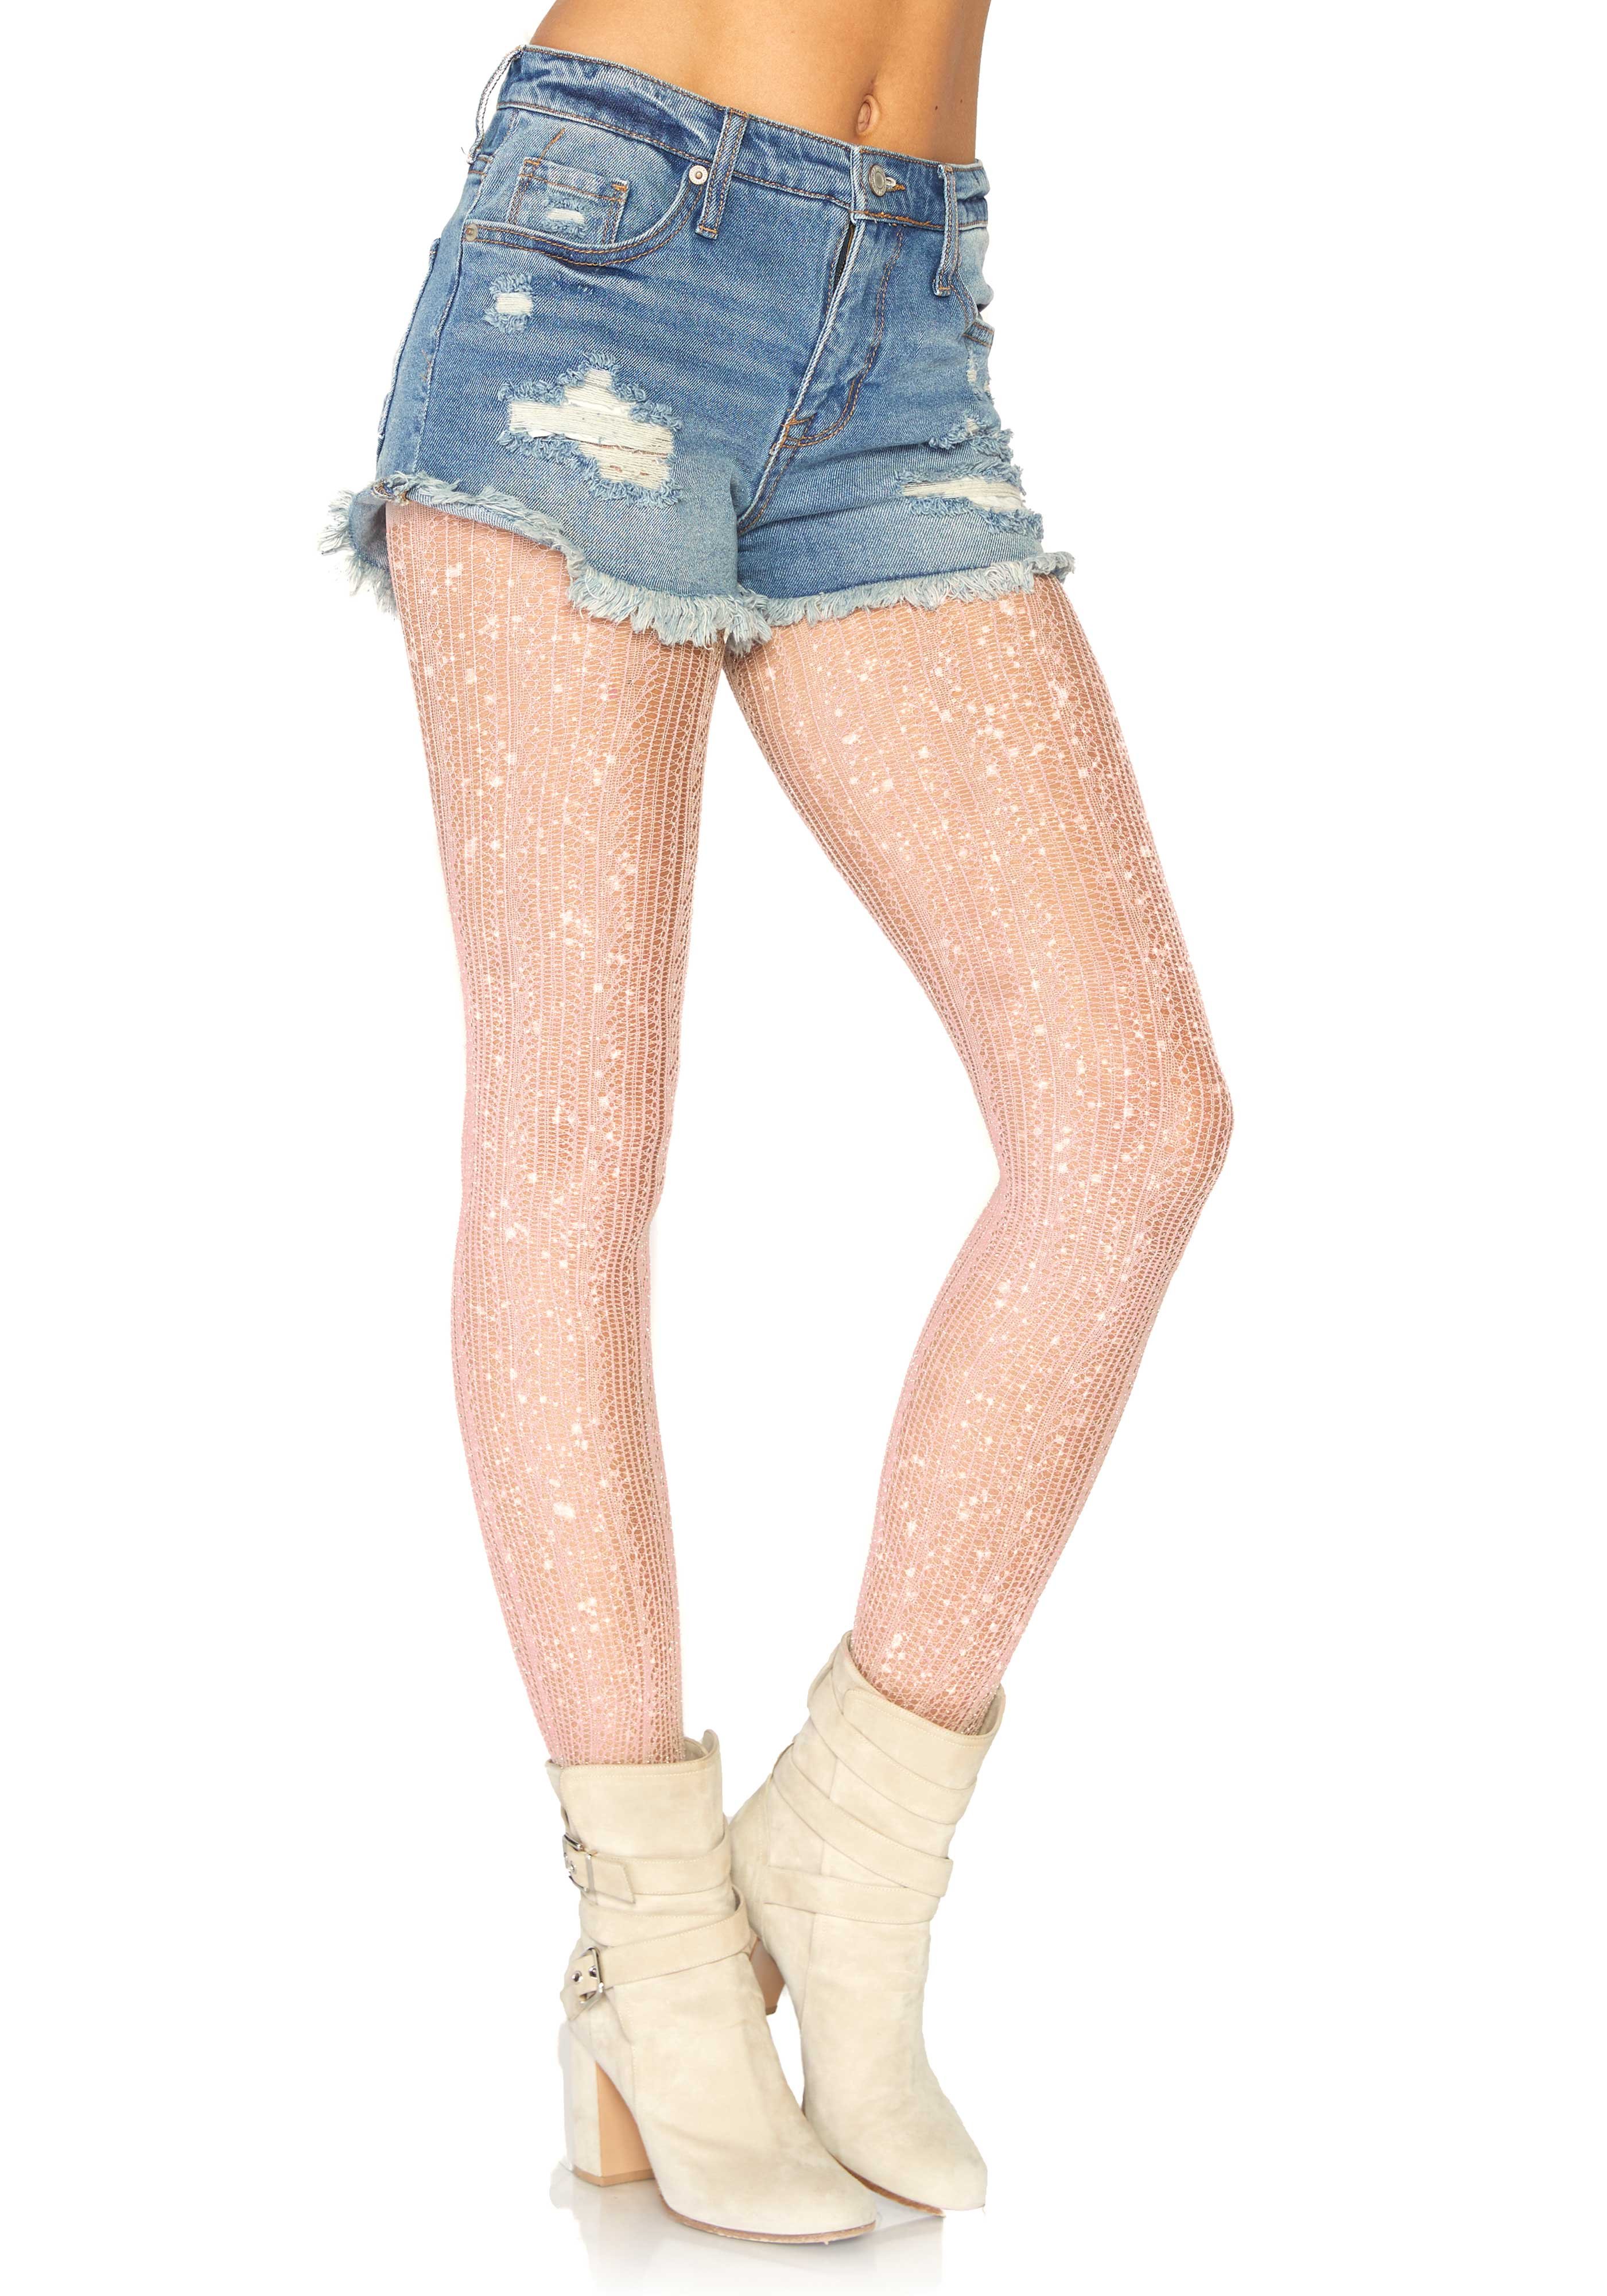 Spandex crocheted stripe lurex pantyhose.